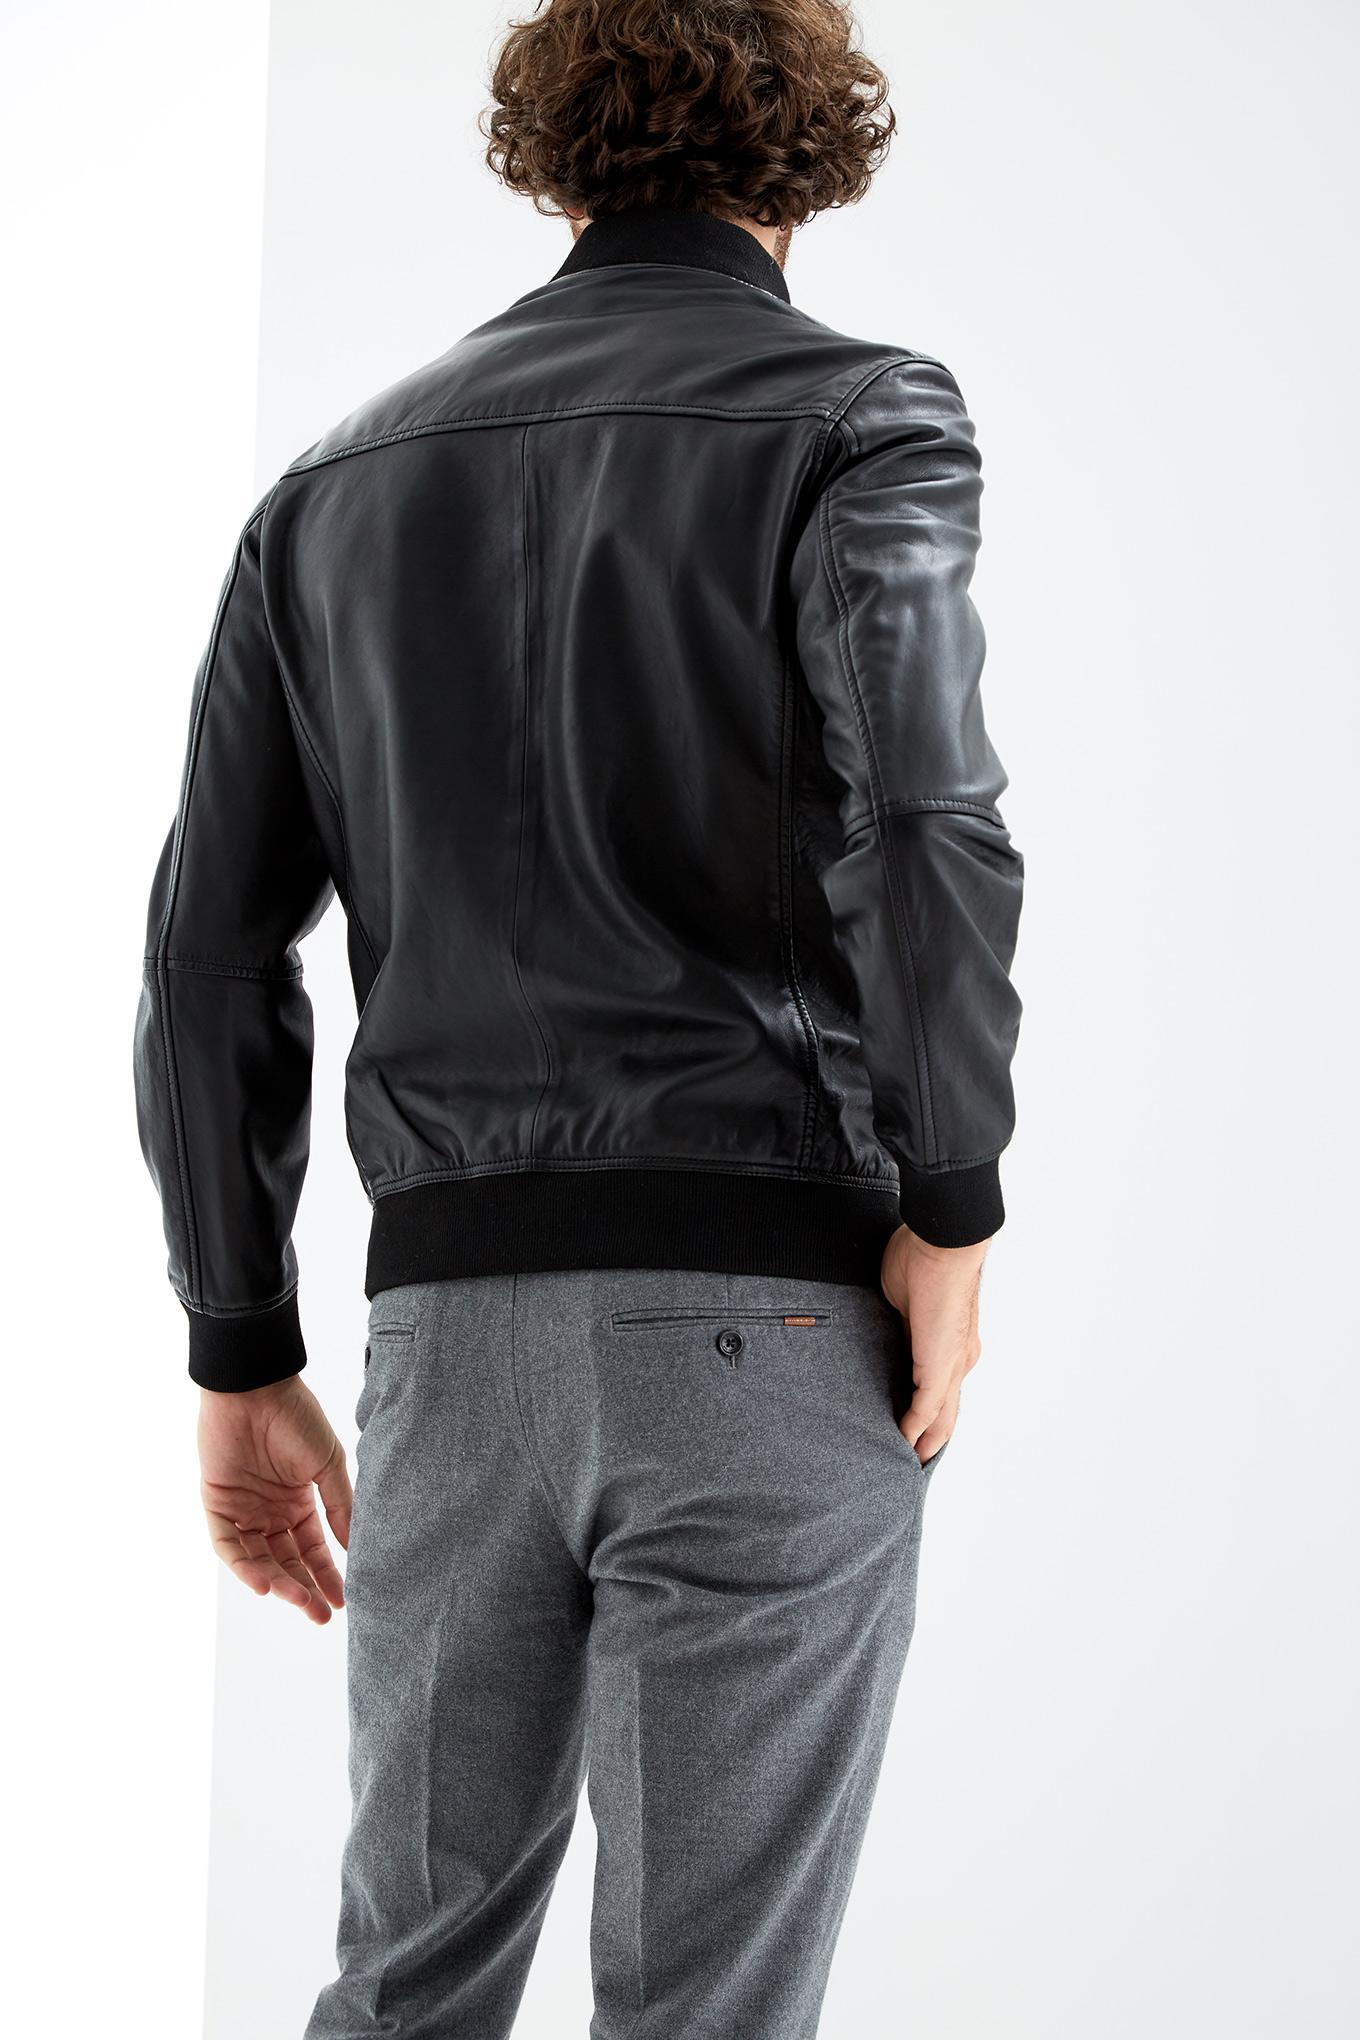 Leather Jacket Black Casual Man